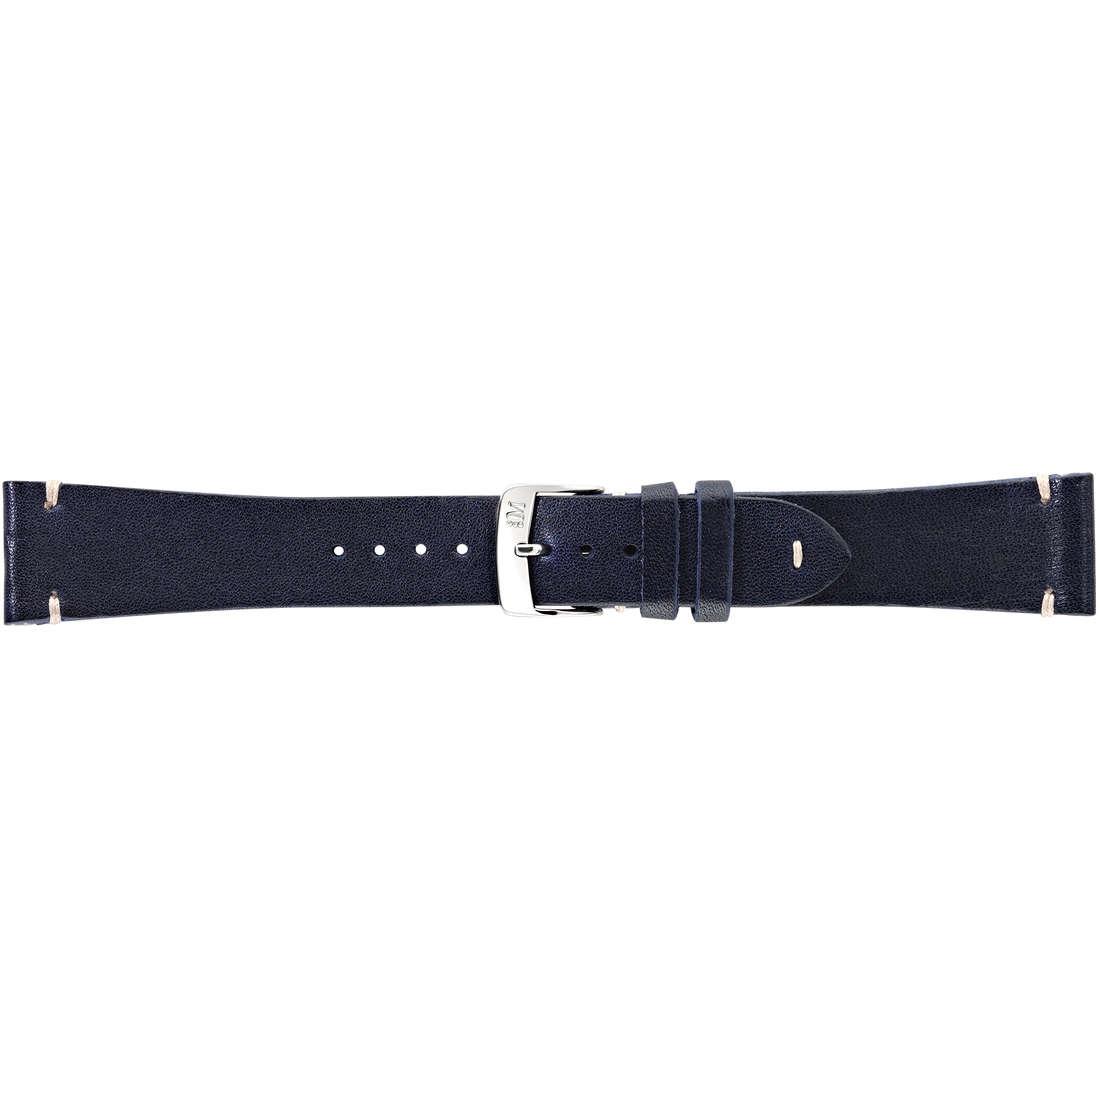 watch watch bands watch straps man Morellato Manufatti A01X4541A76062CR20